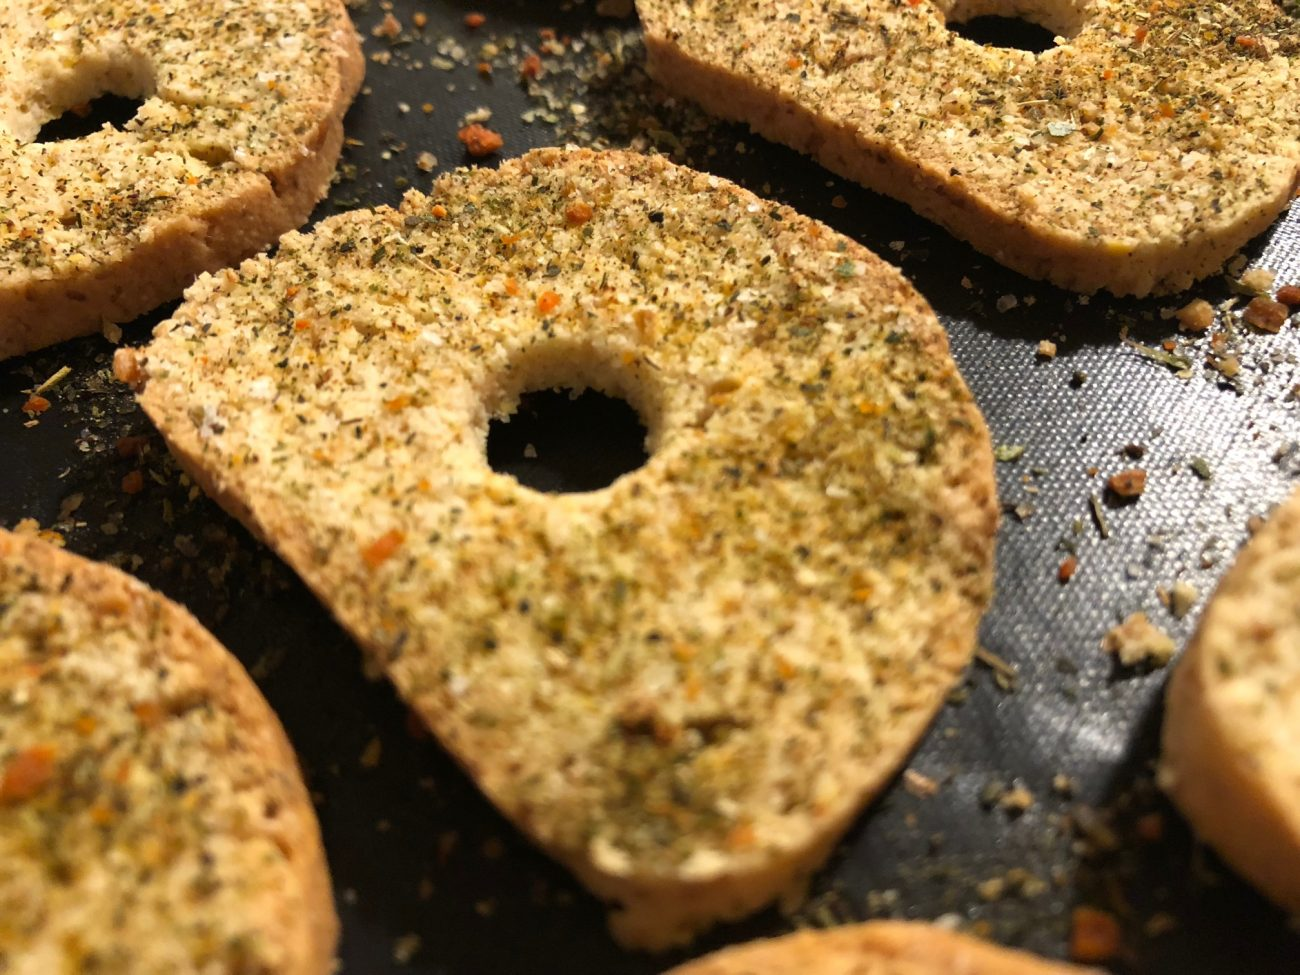 Bake rolls χωρίς αλεύρι/γλουτένη (low-carb & keto)